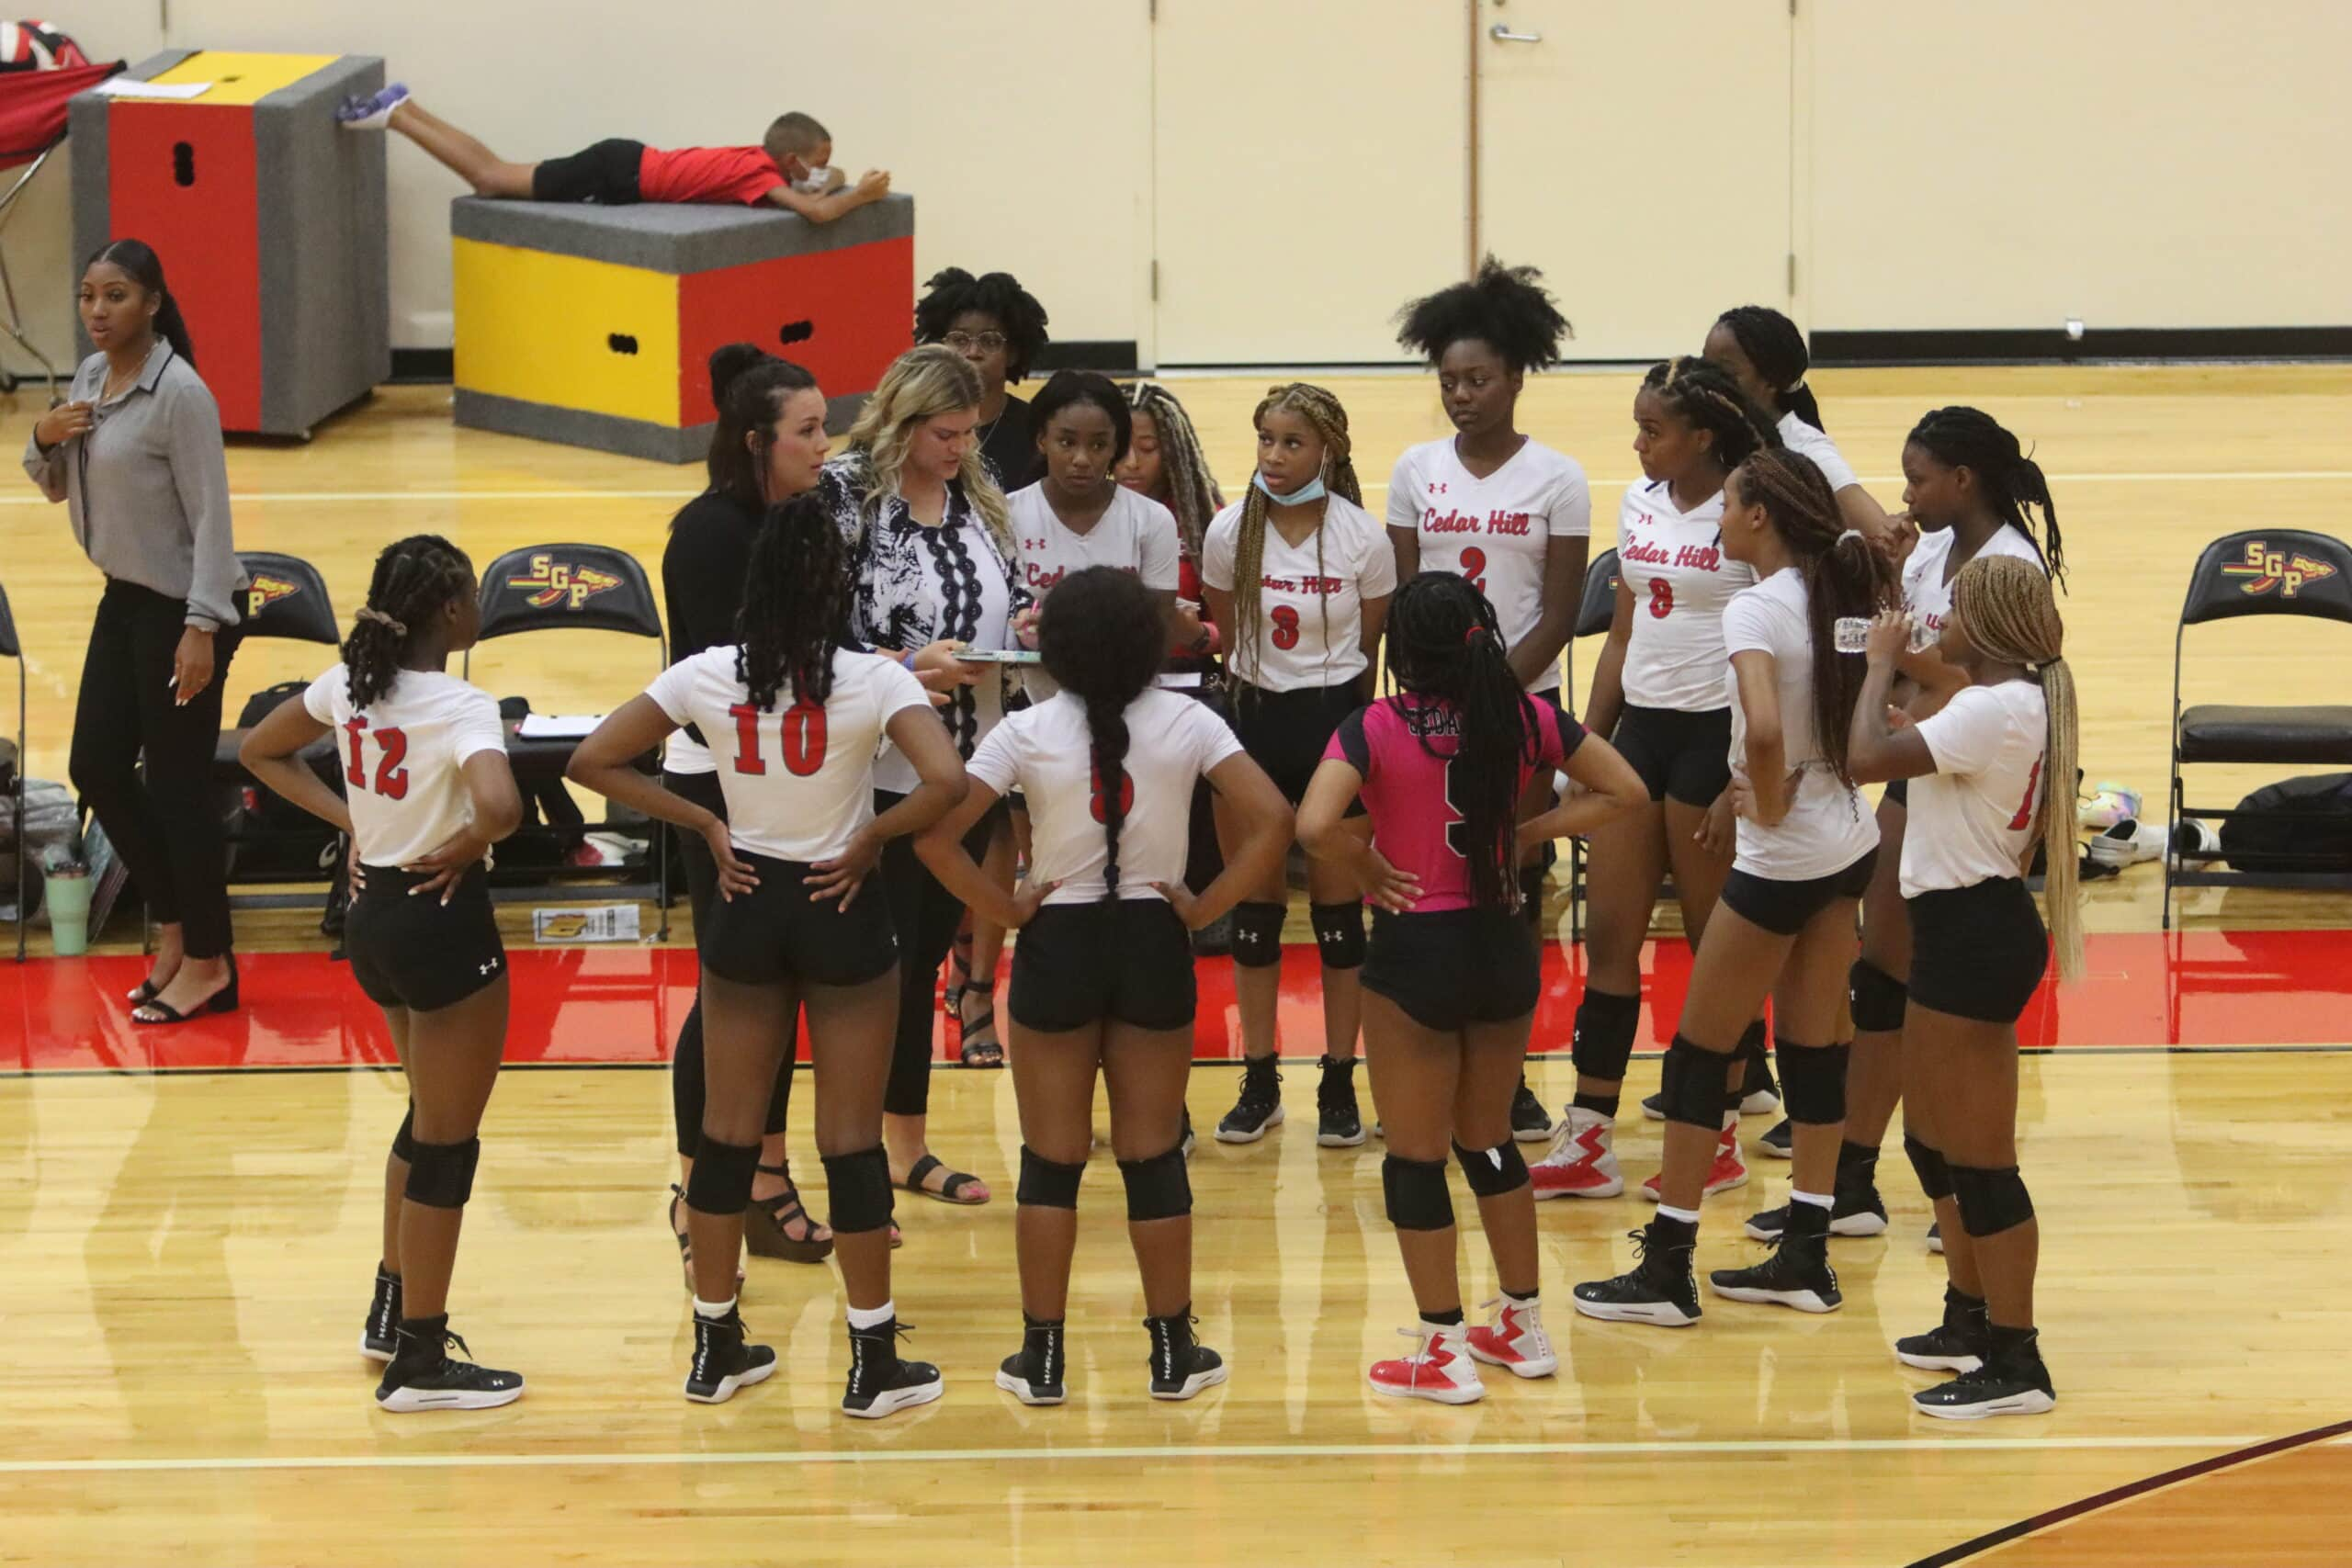 Cedar Hill volleyball team on sideline